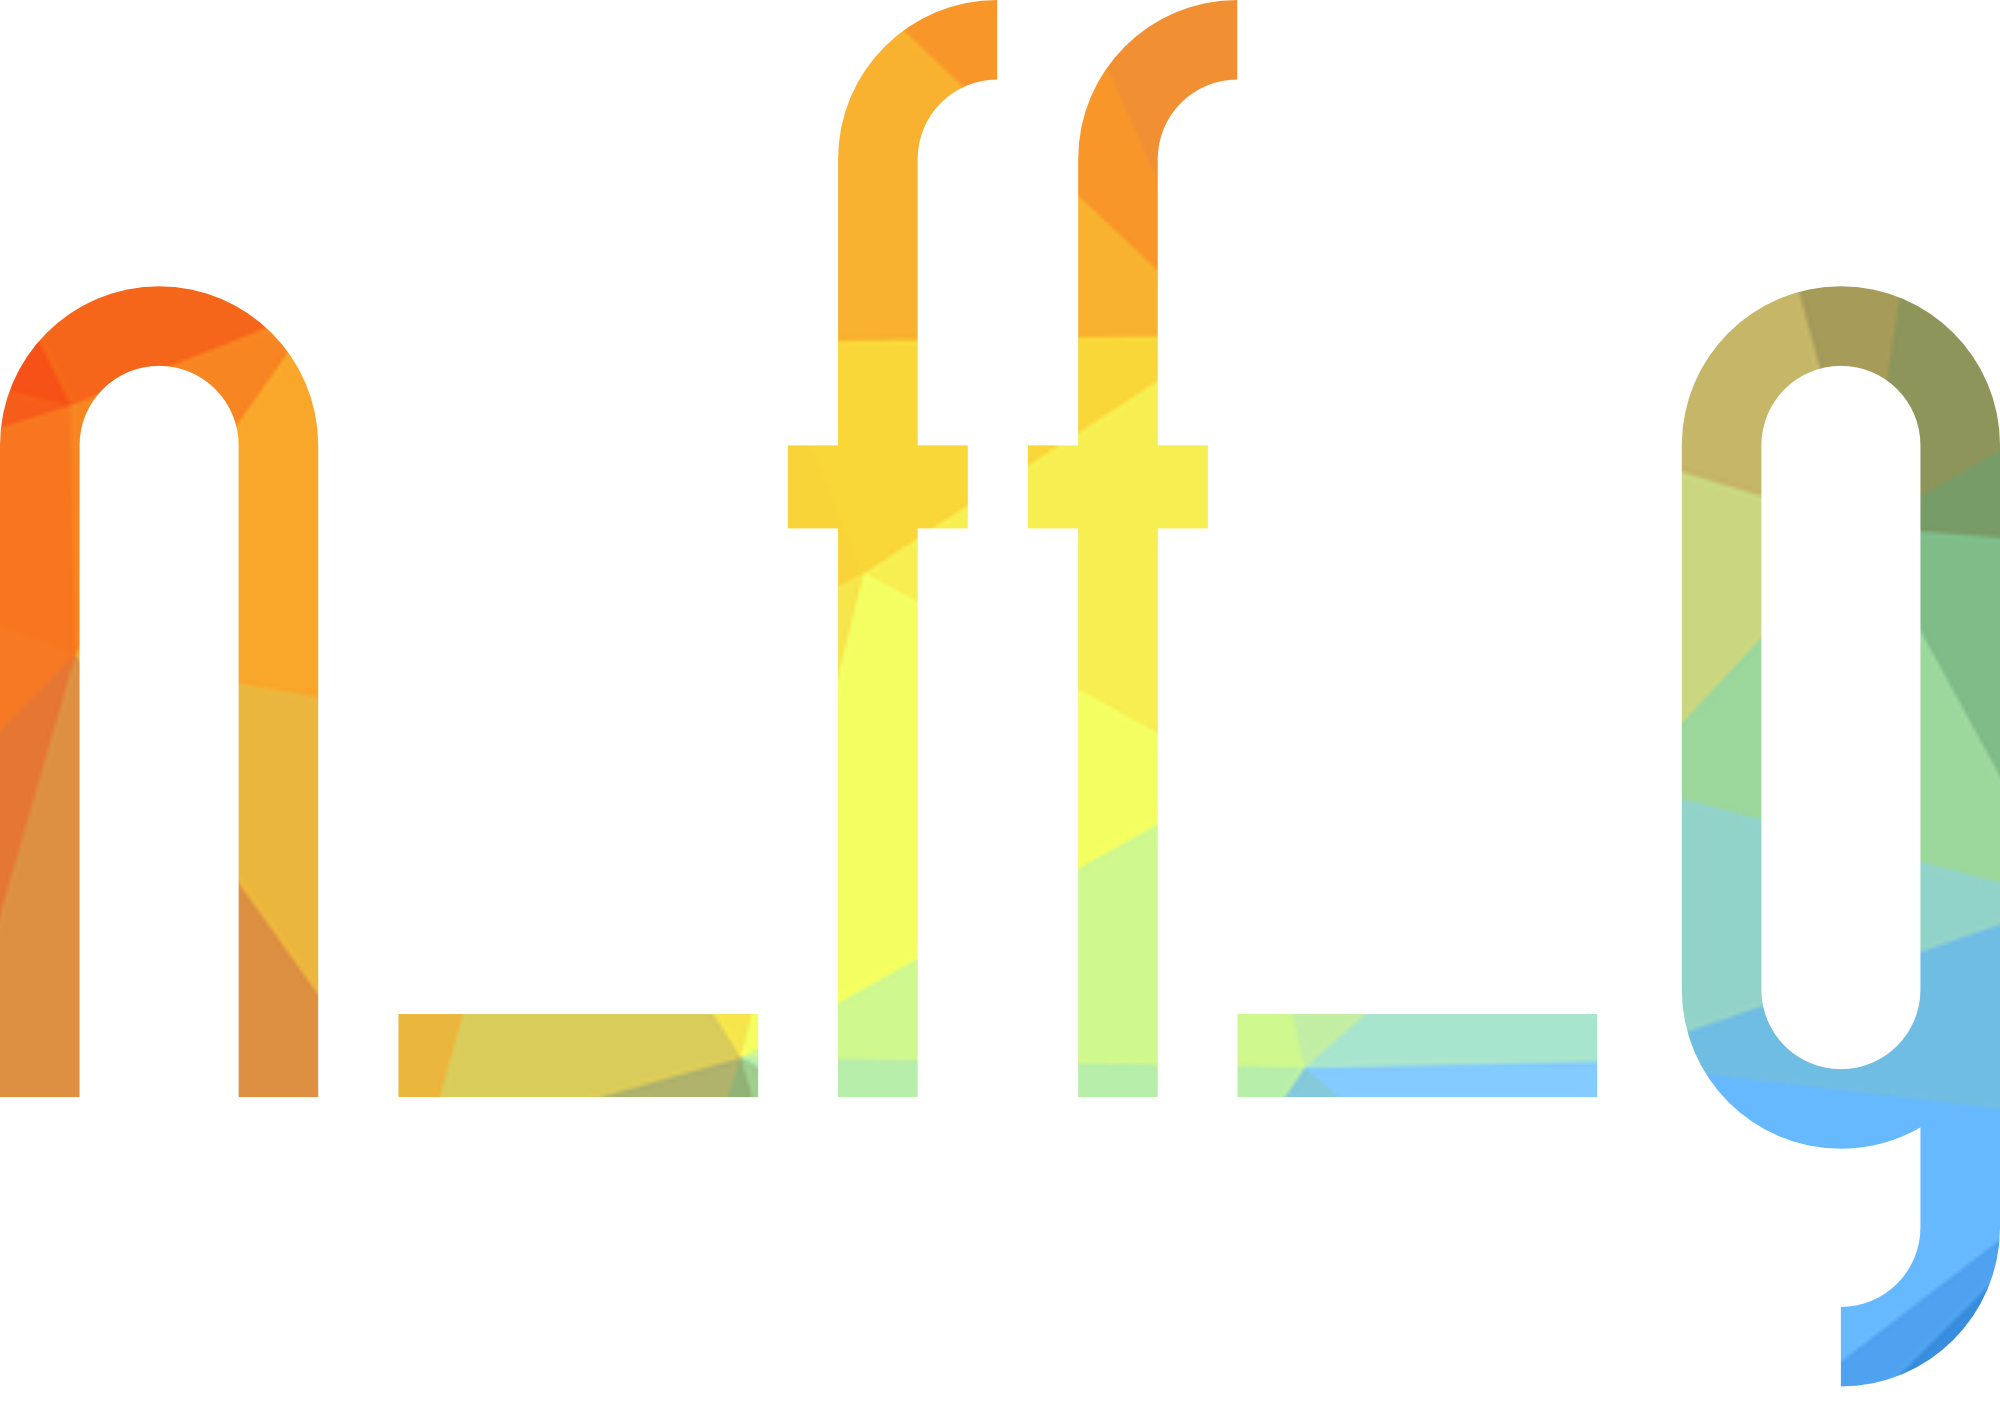 Netzkulturfestival